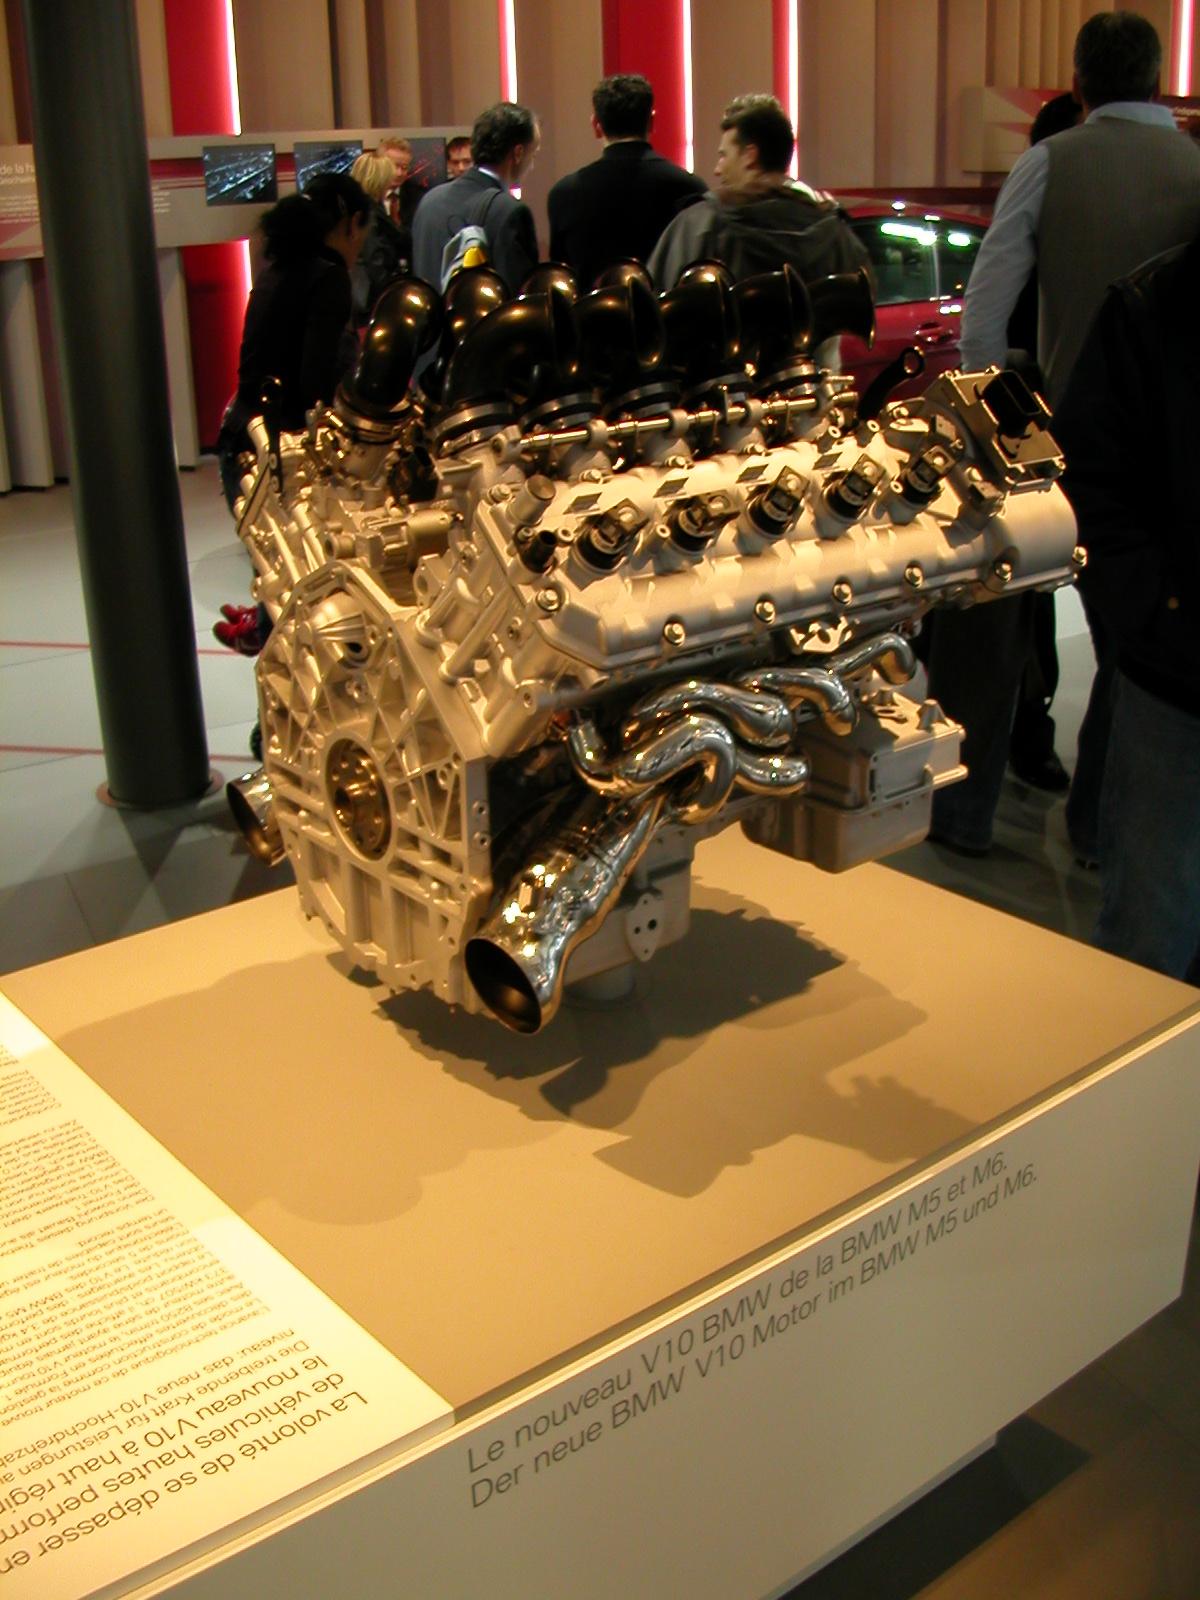 Bmw m6 V10 Engine File:bmw Engine m5 And M6.jpg